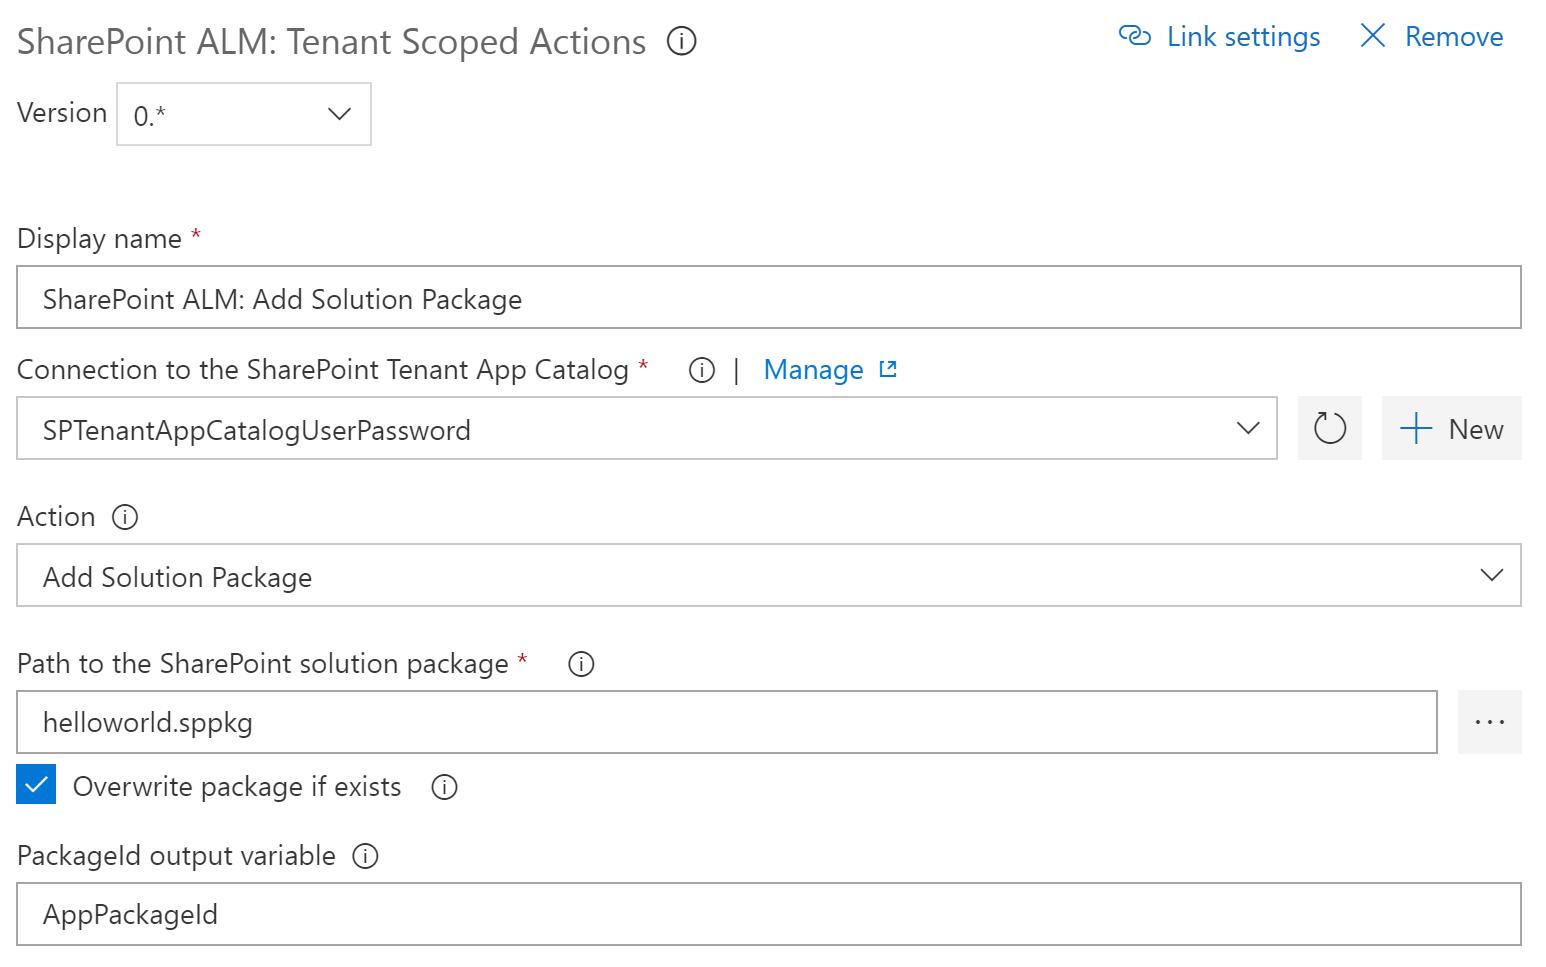 Catalog Scoped Action: Add